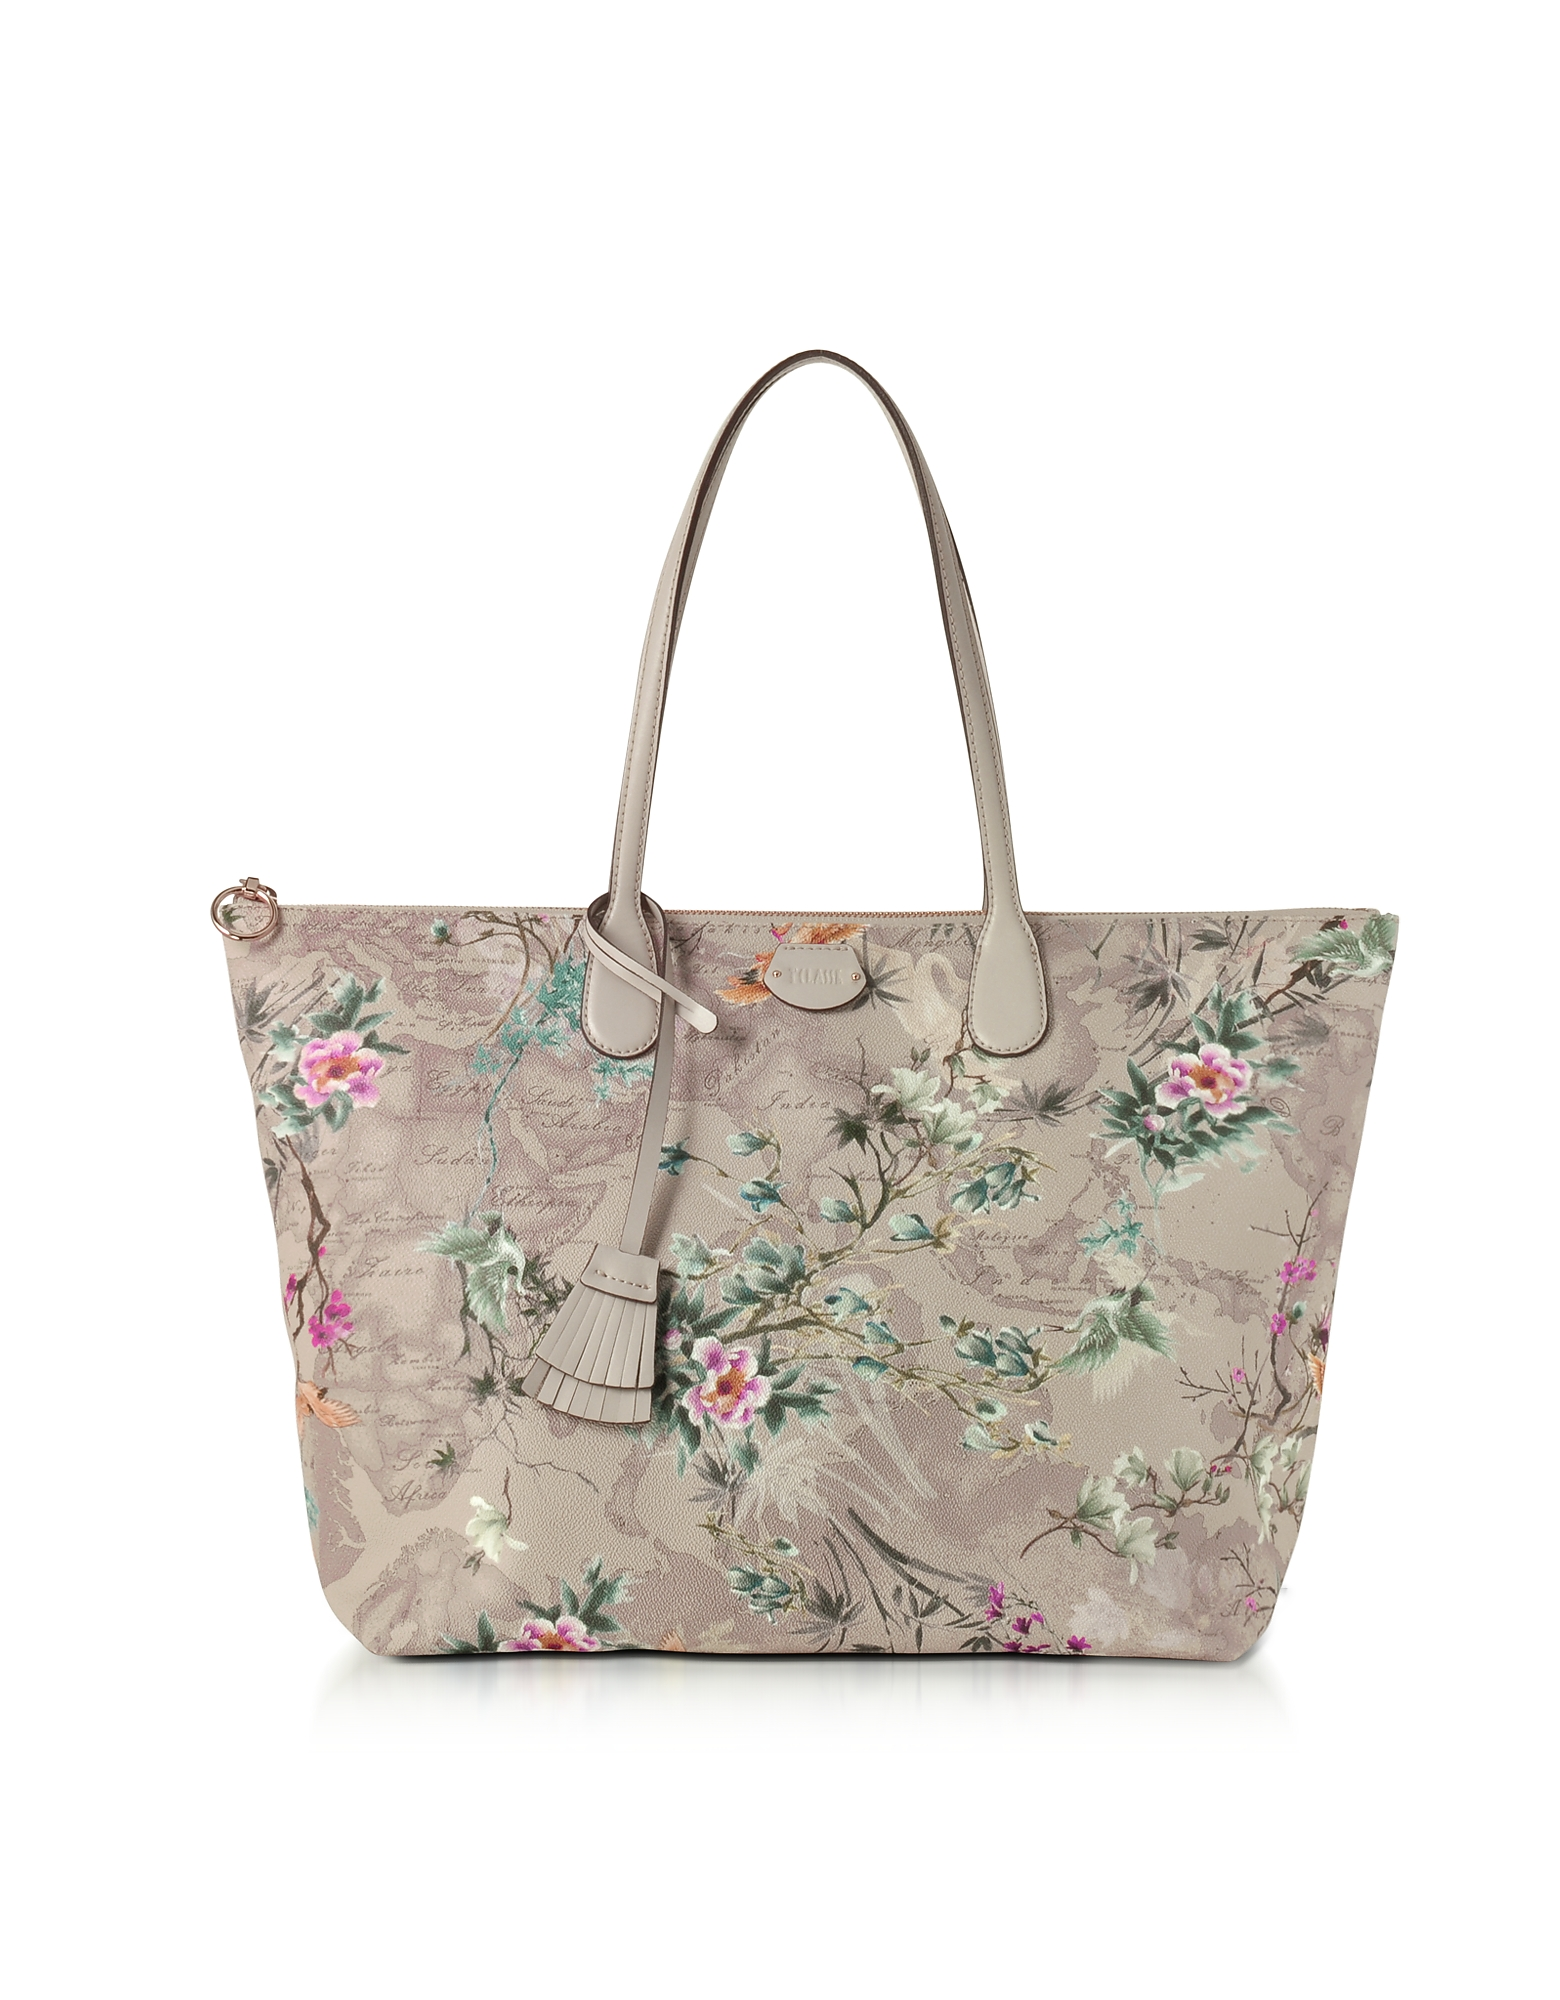 Alviero Martini 1A Classe Handbags, Large Oriental Garden Tote Bag